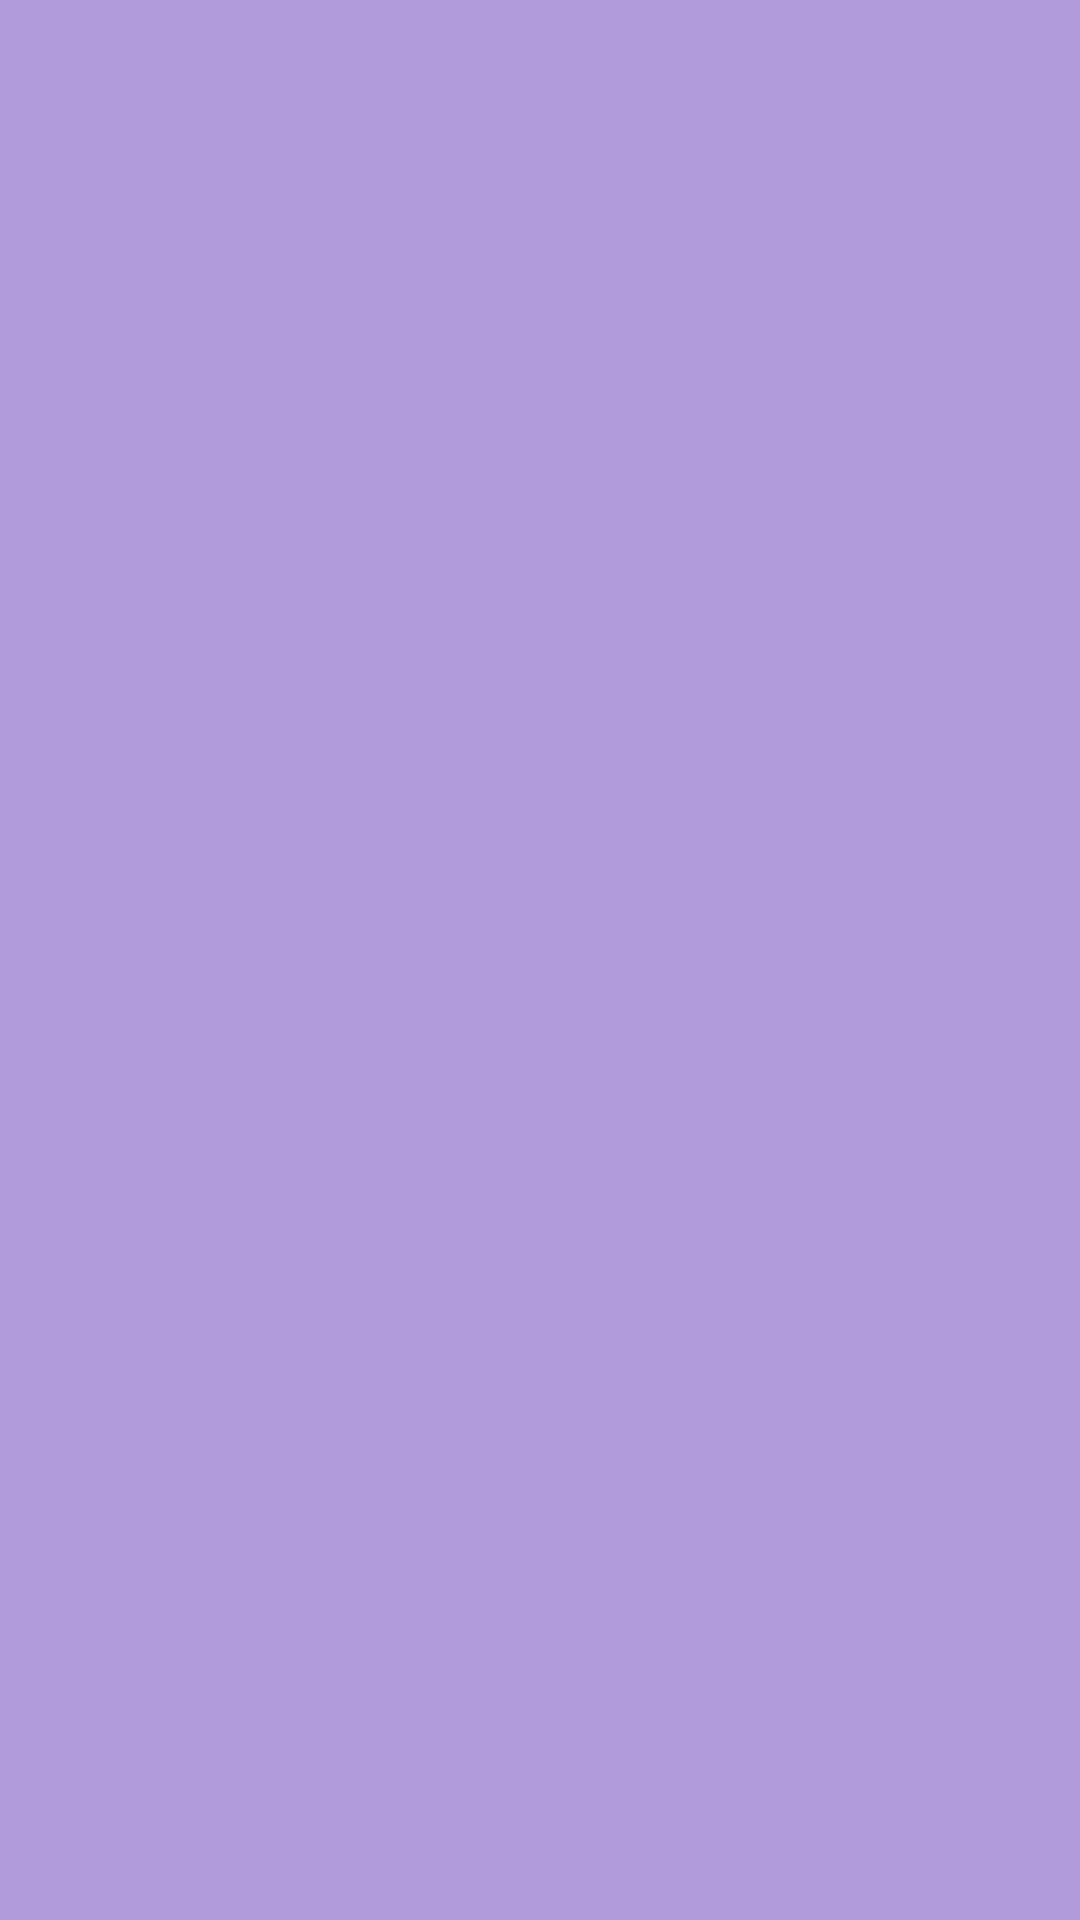 1080x1920 Light Pastel Purple Solid Color Background